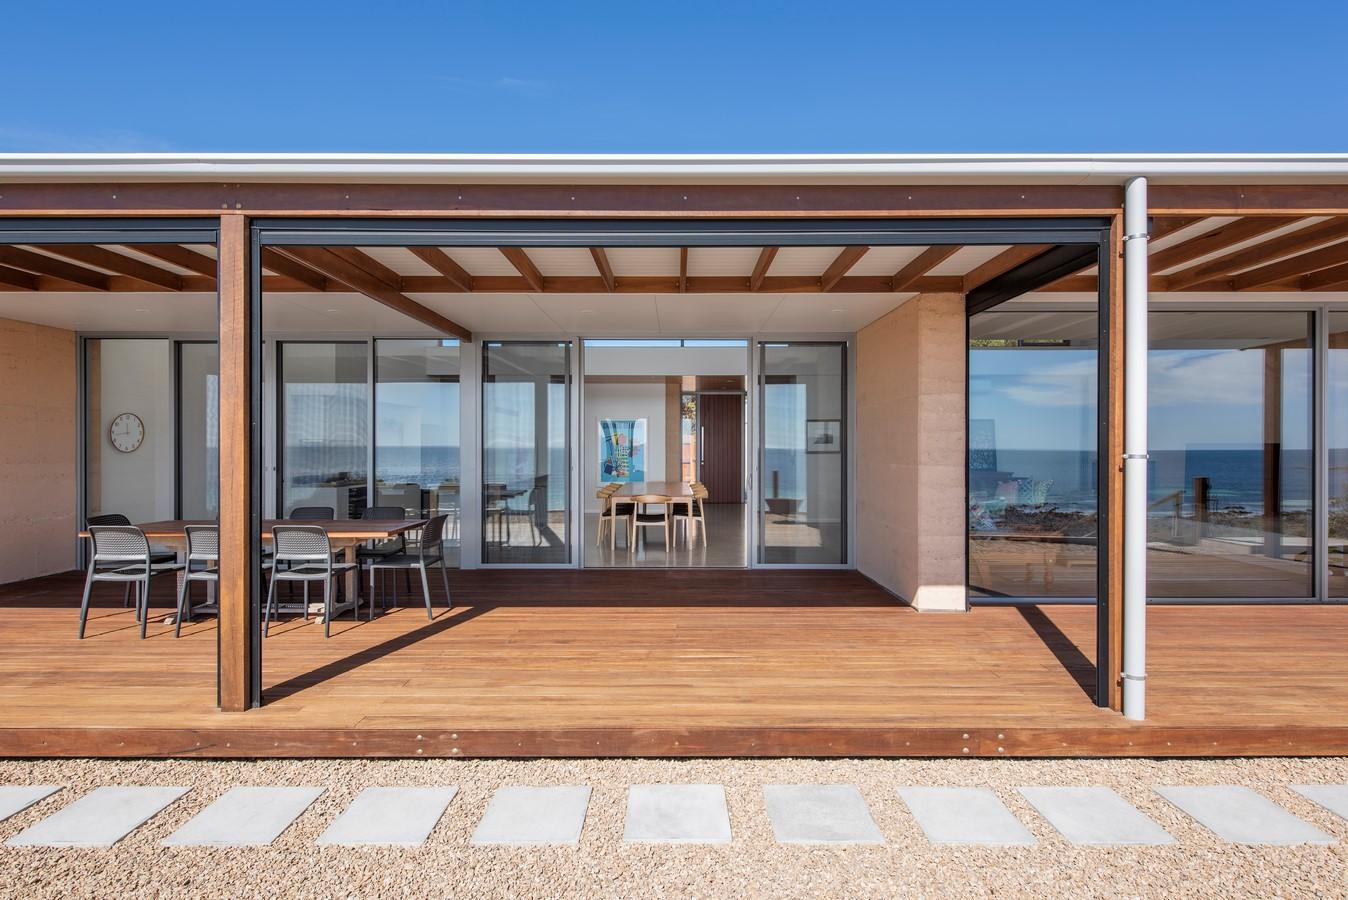 5162 Yorke Peninsula Beach House by Mountford William: Sheet 2